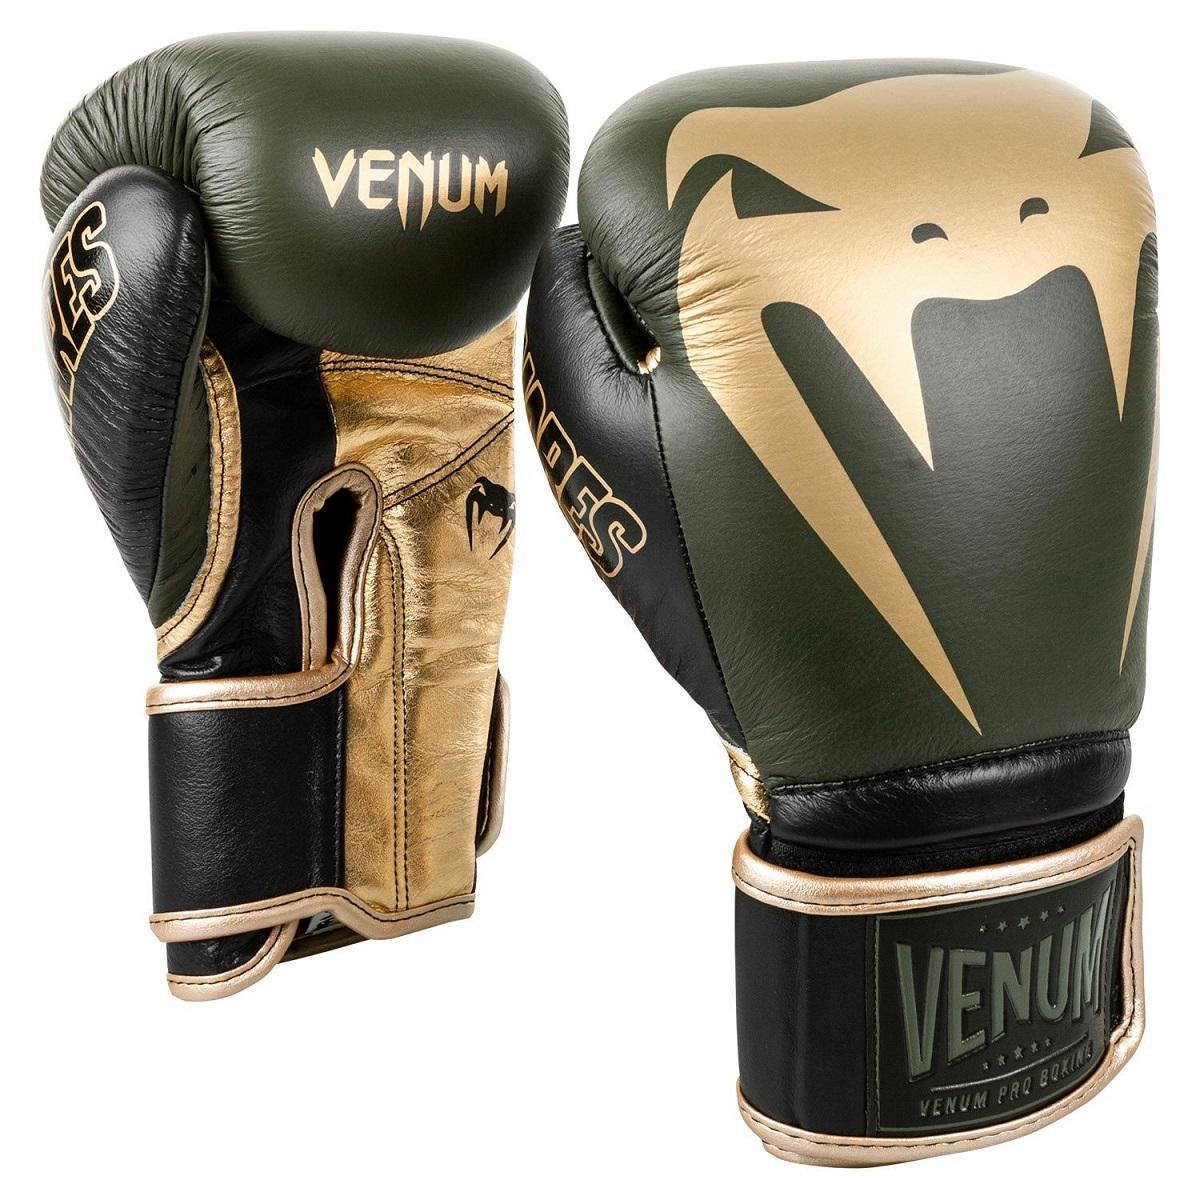 VENUM ボクシンググローブ マジックテープ式 GIANT 2.0 PRO BOXING GLOVES LINARES EDITION //ボクシング キックボクシング スパーリング 送料無料